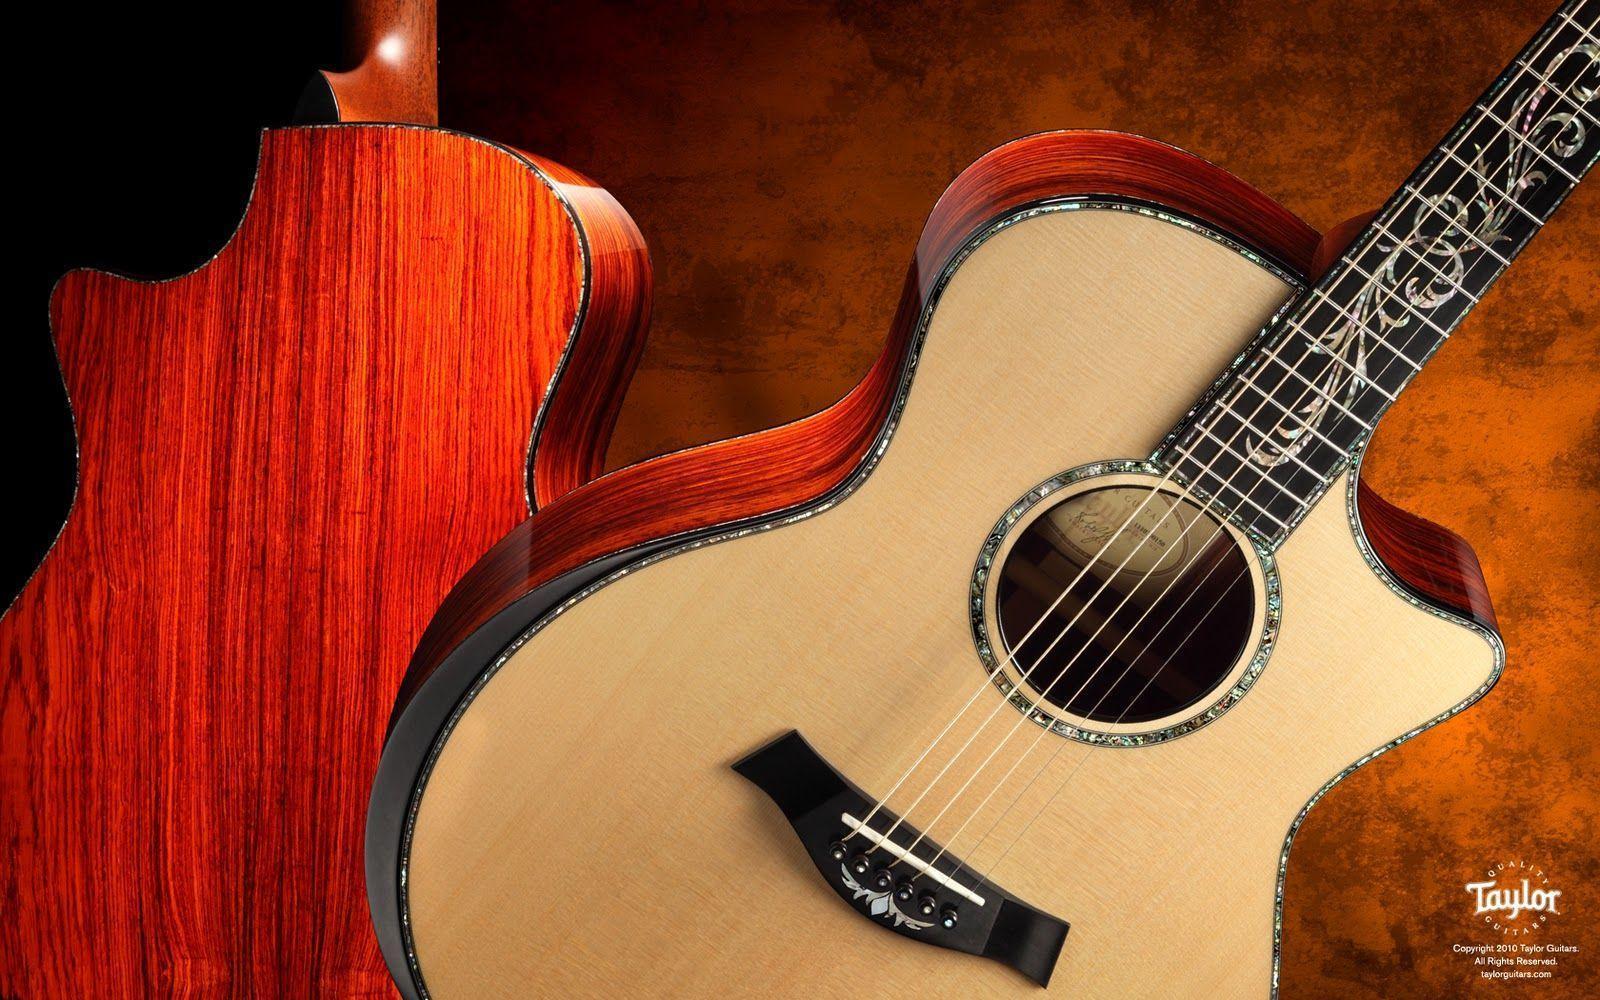 taylor guitars wallpapers - photo #12